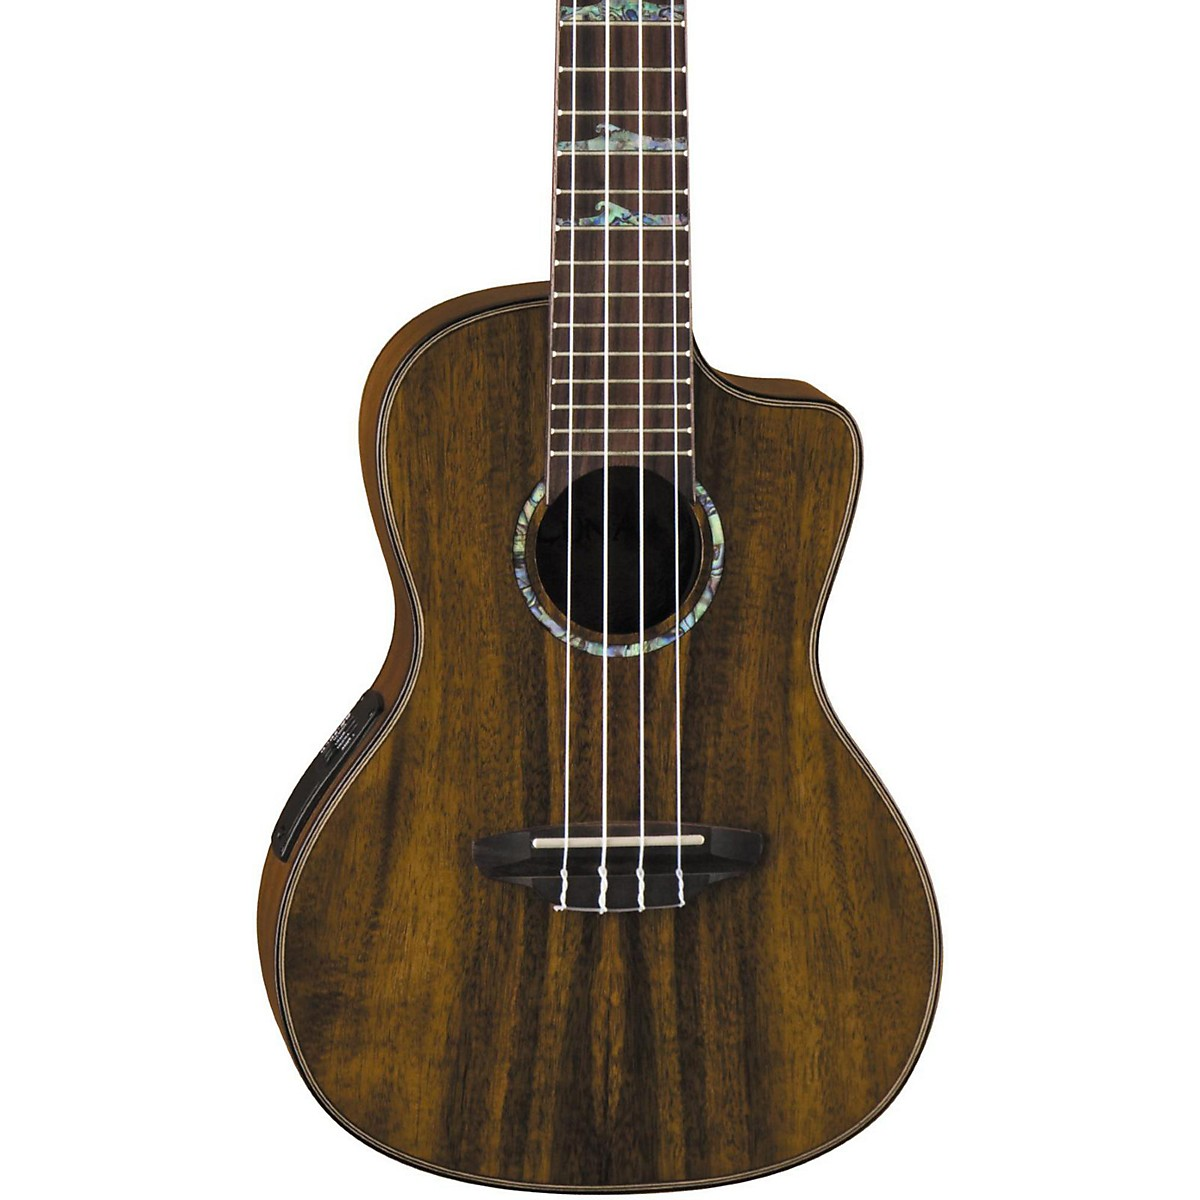 Luna Guitars High Tide Koa Concert Acoustic-Electric Ukulele